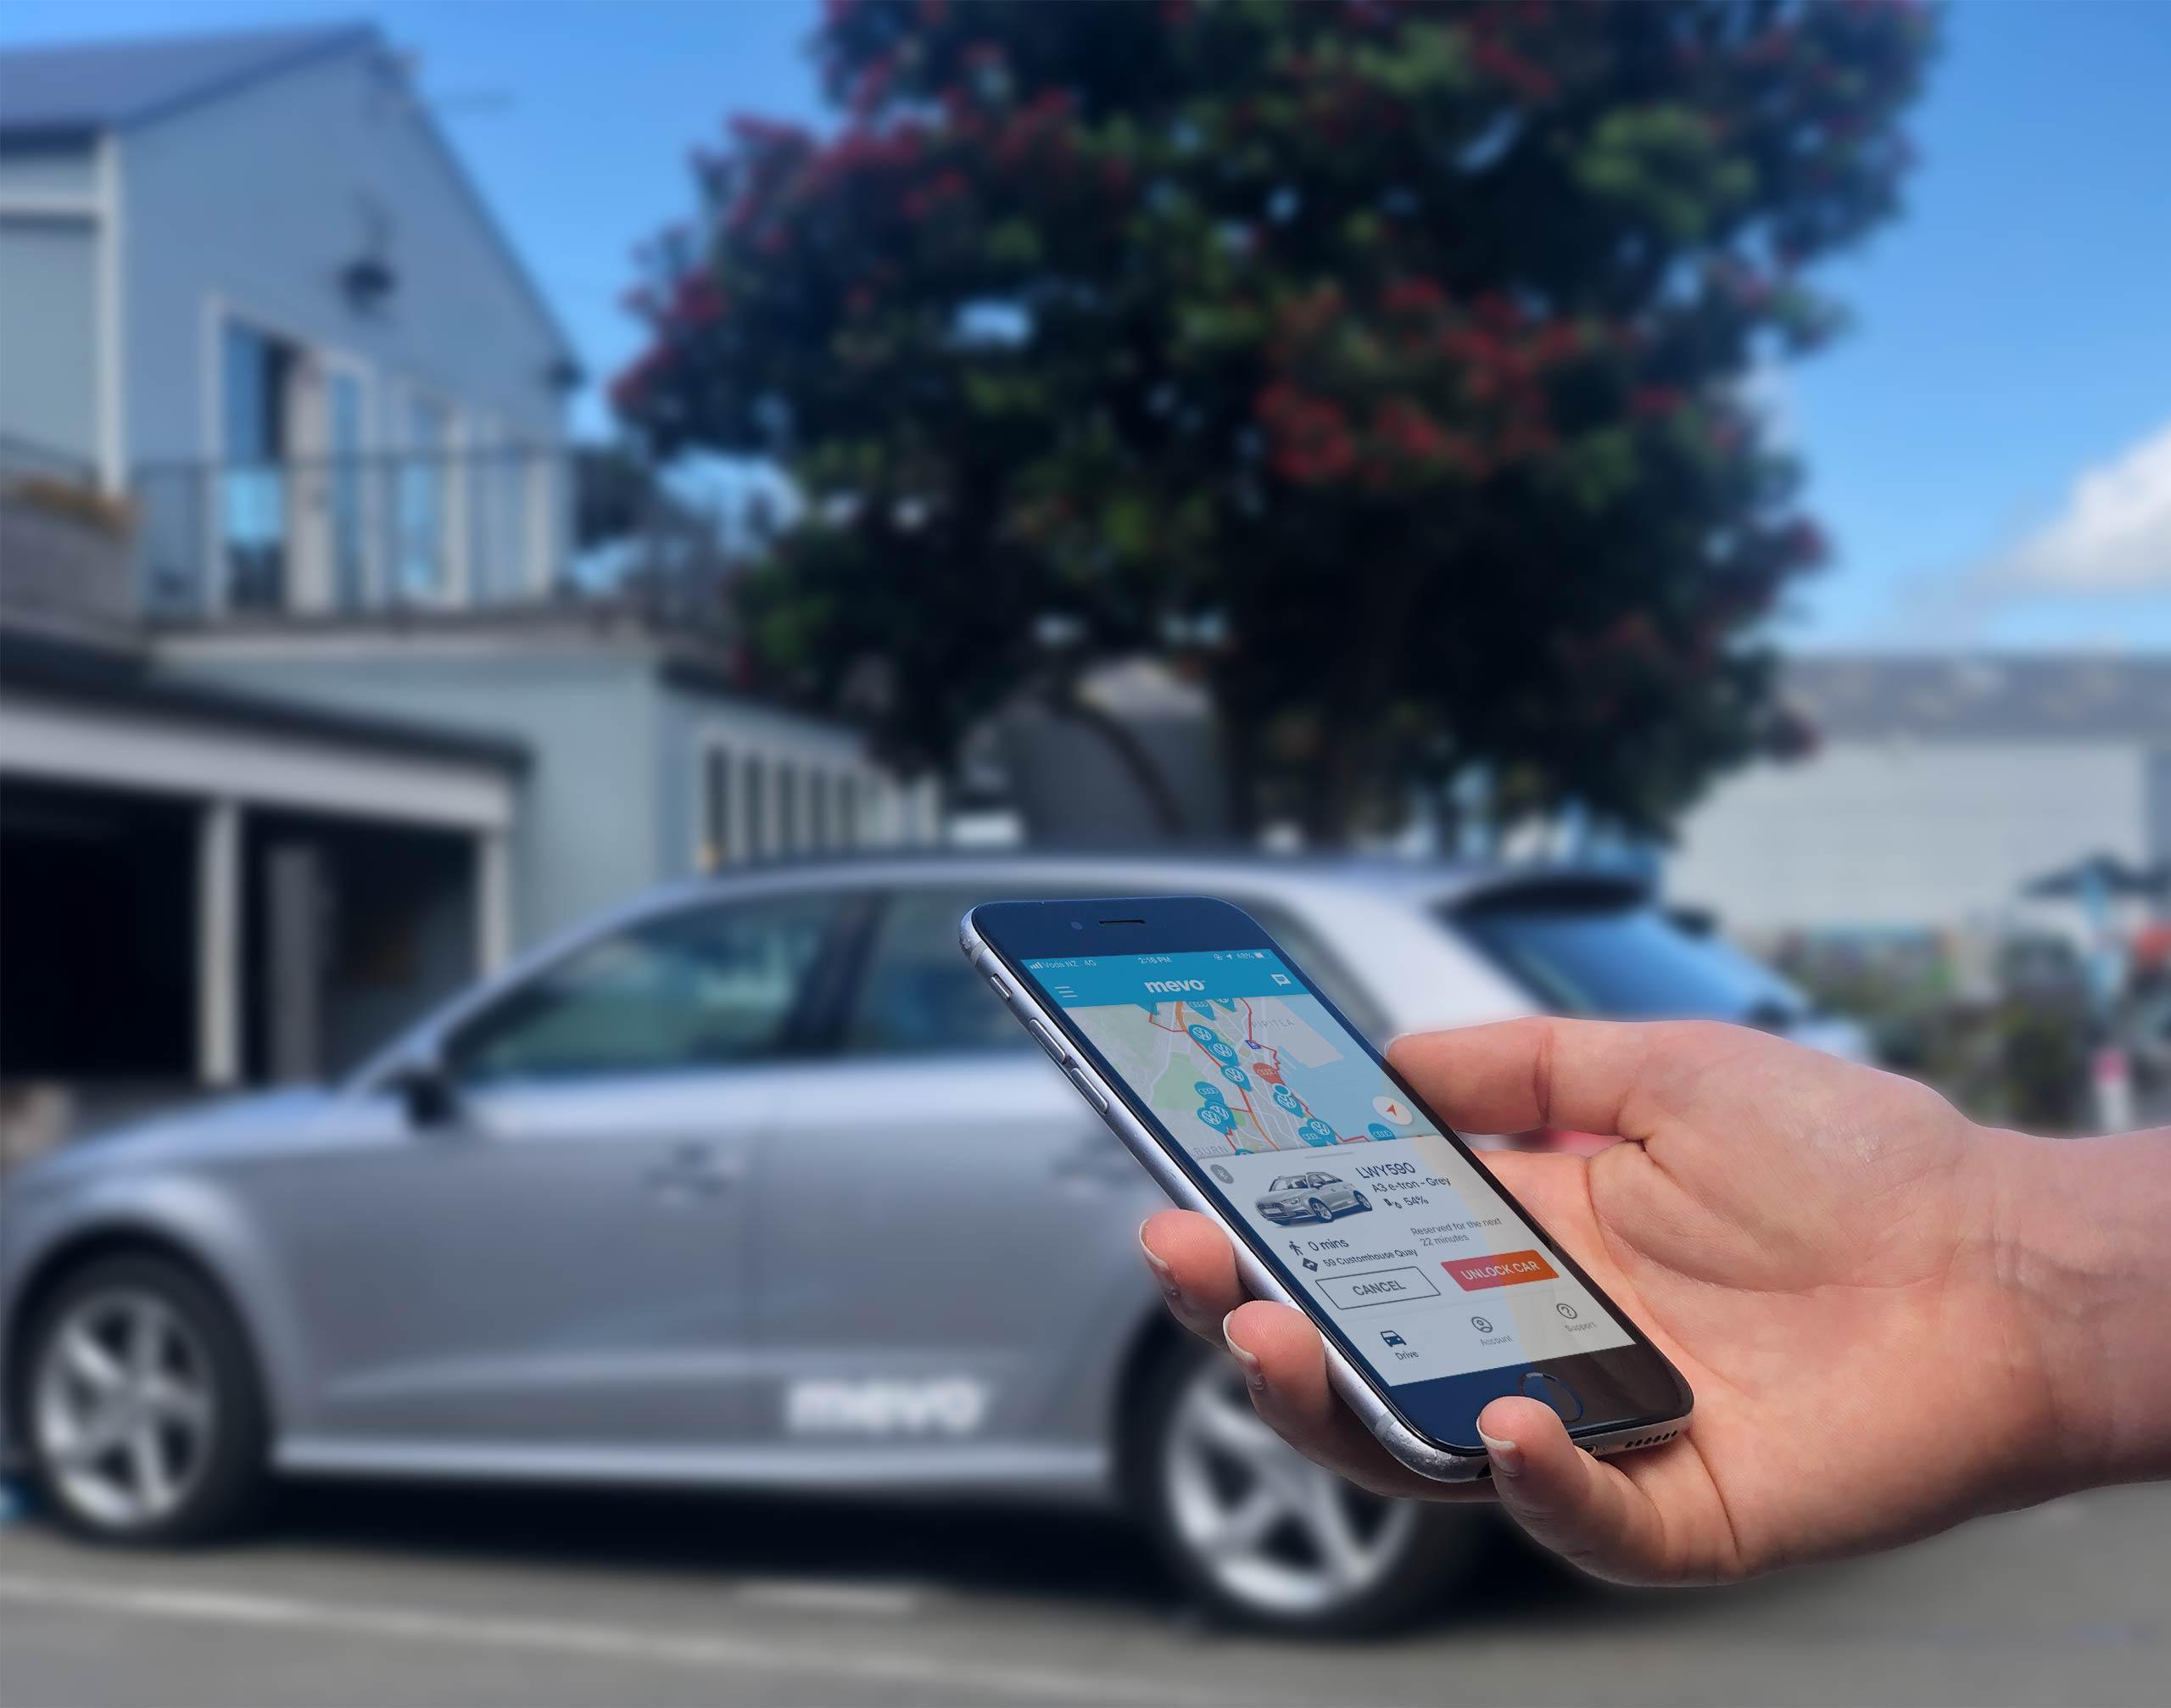 Mevo app on an iPhone being held in front of a Mevo car